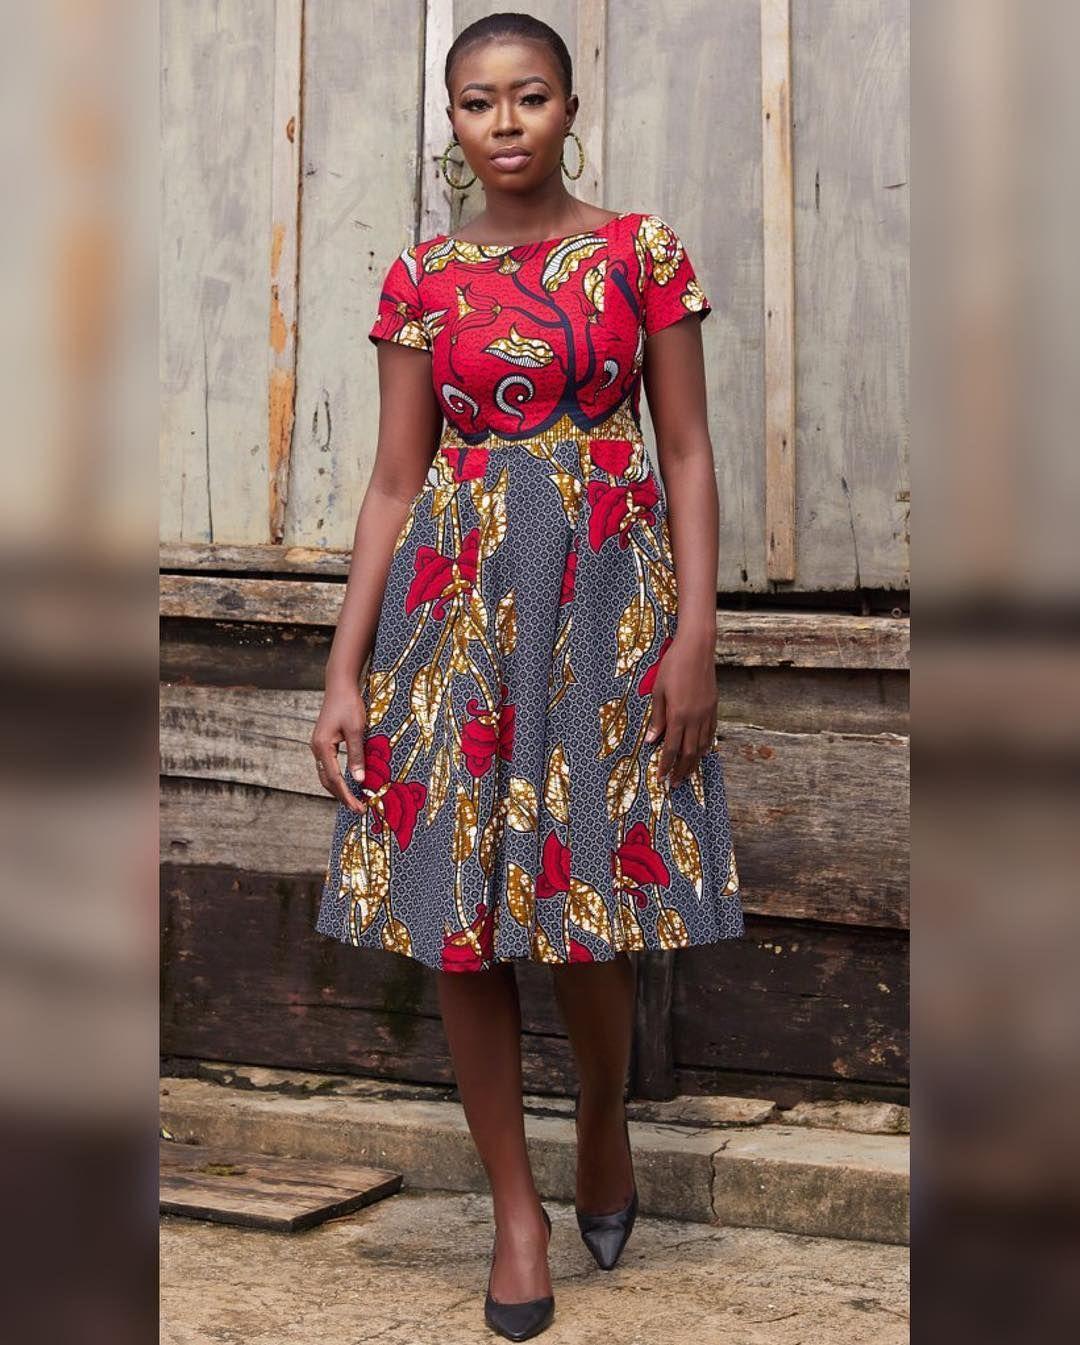 Ankara Jumpsuits Are Trendy Stylish And Fashionable Mammypi Com African Fashion Modern African Attire African Fashion Women [ 1345 x 1080 Pixel ]